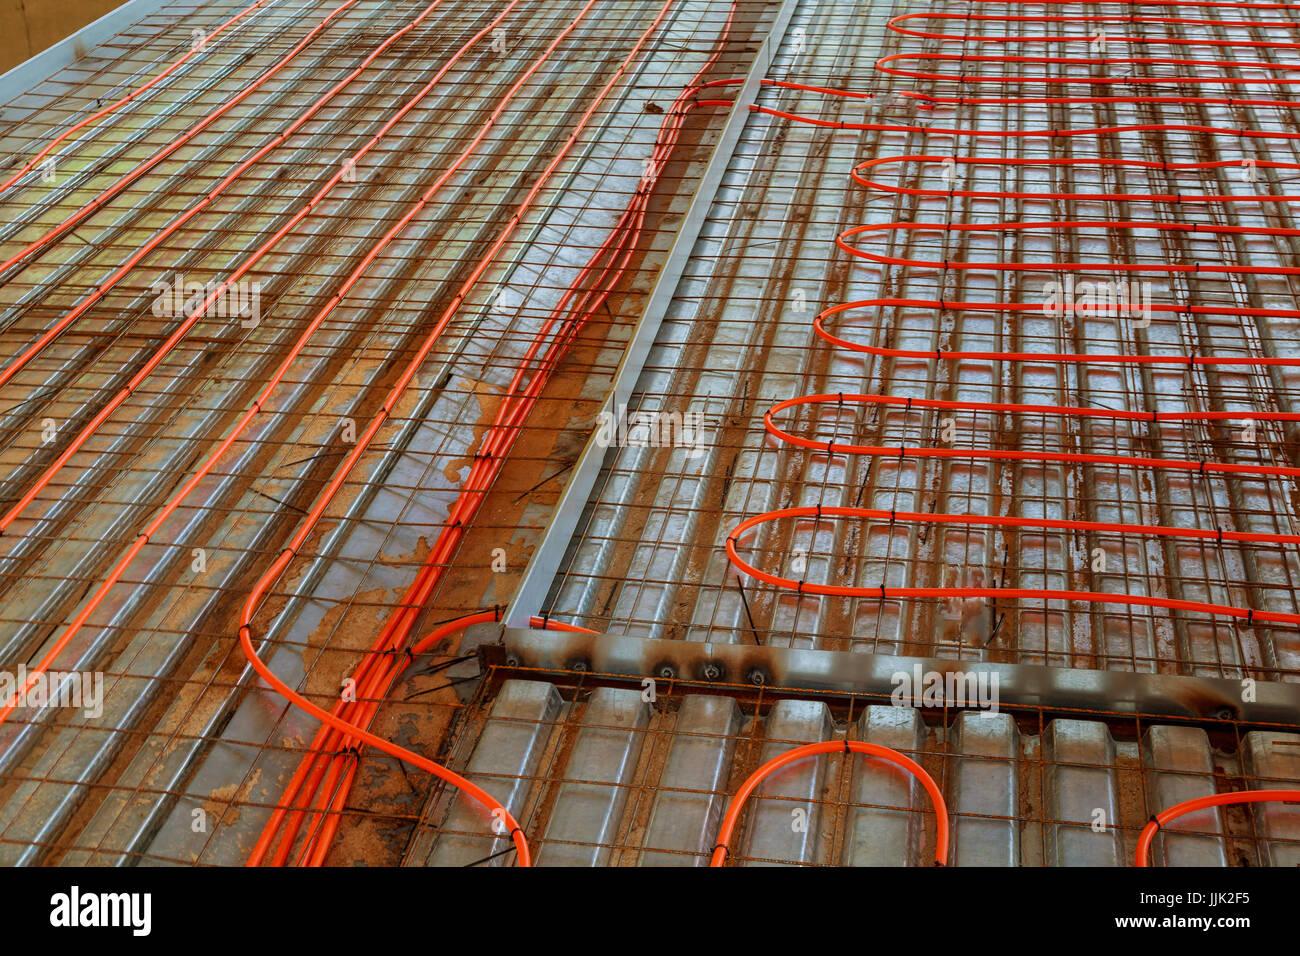 Riscaldamento A Pavimento Tubi nuovo sistema di riscaldamento a pavimento i tubi e il